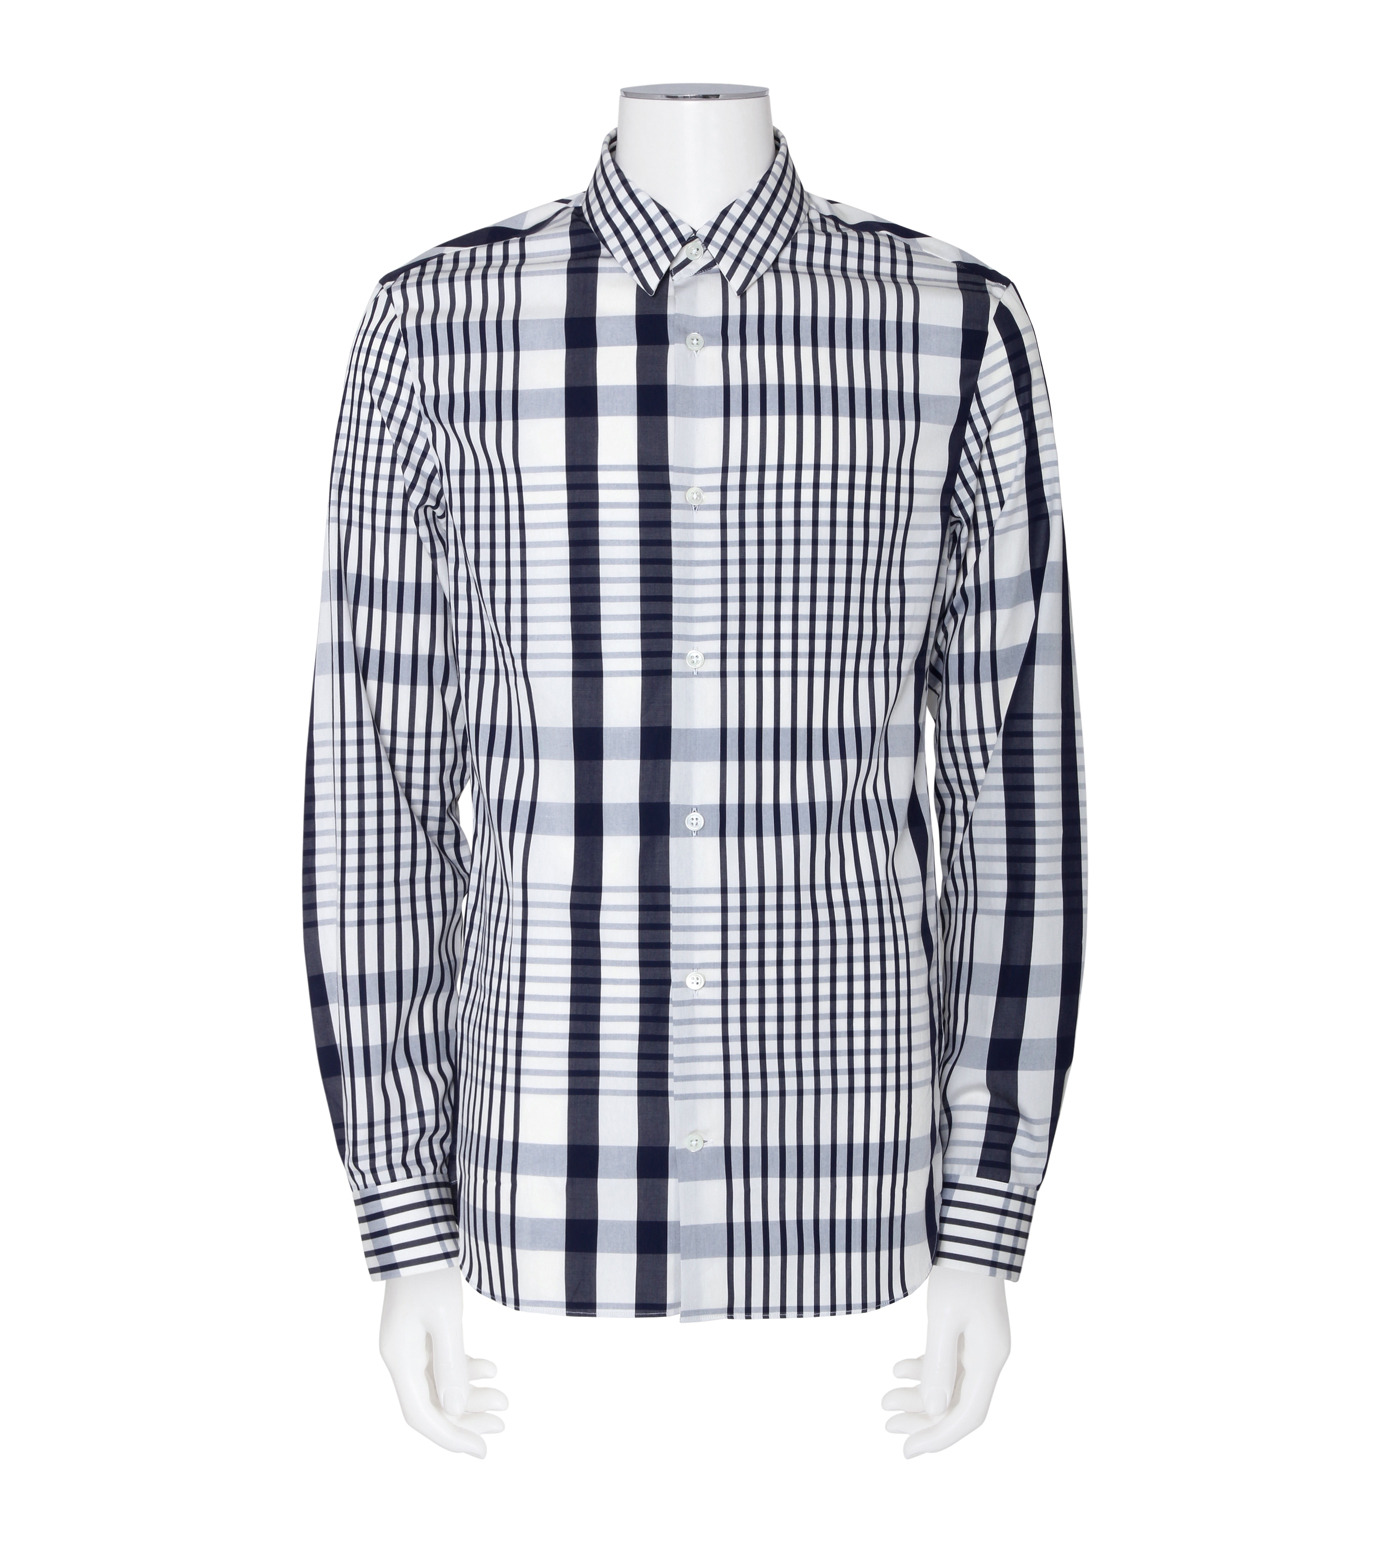 ACNE STUDIOS(アクネ ストゥディオズ)のCheck Shirt-NAVY(シャツ/shirt)-21K163-93 拡大詳細画像1